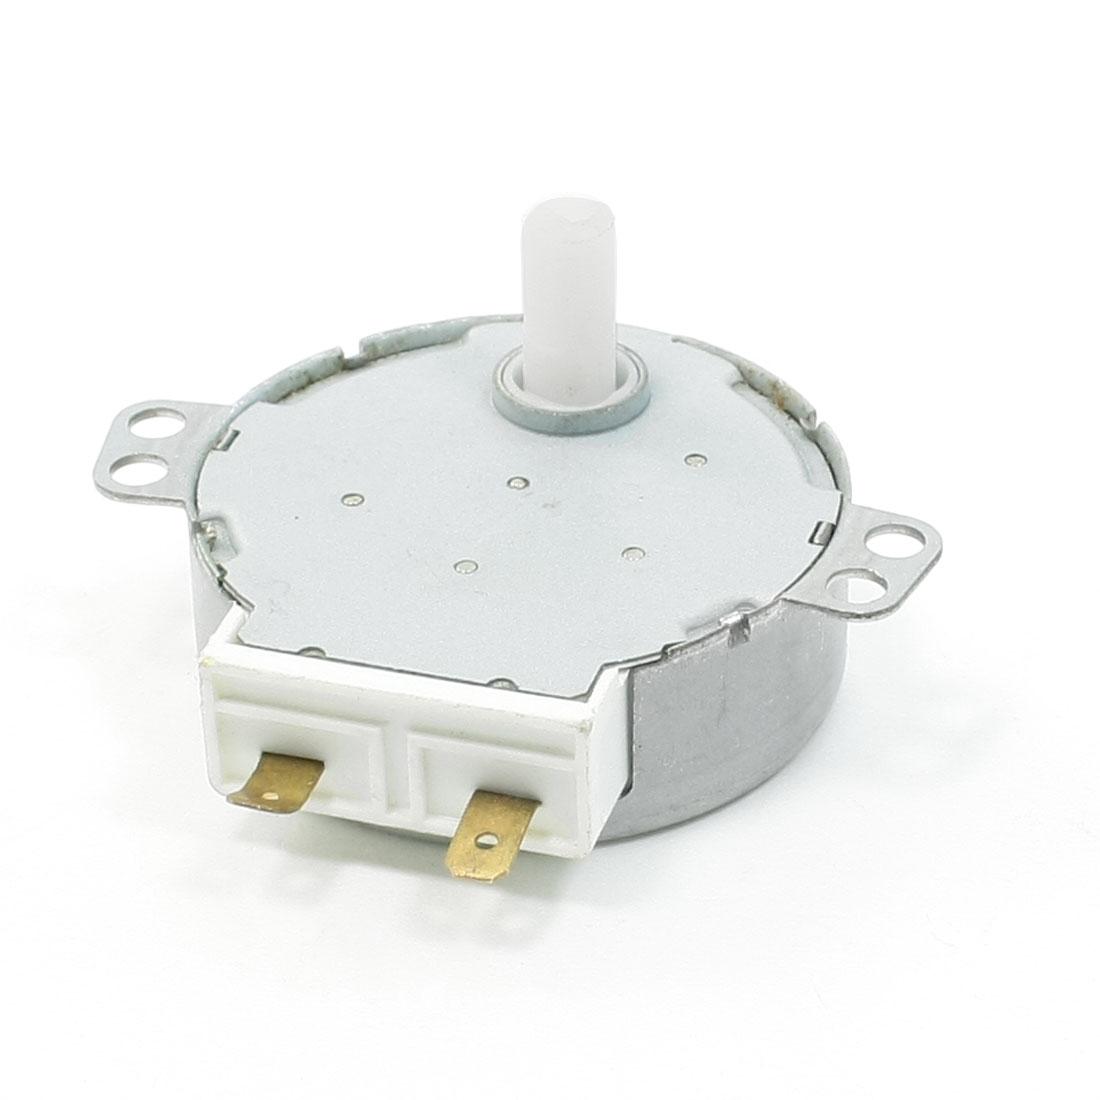 Microwave Oven Synchronous Motor 5-6R/Min AC 220V/240V 4W 49TYZ-A2